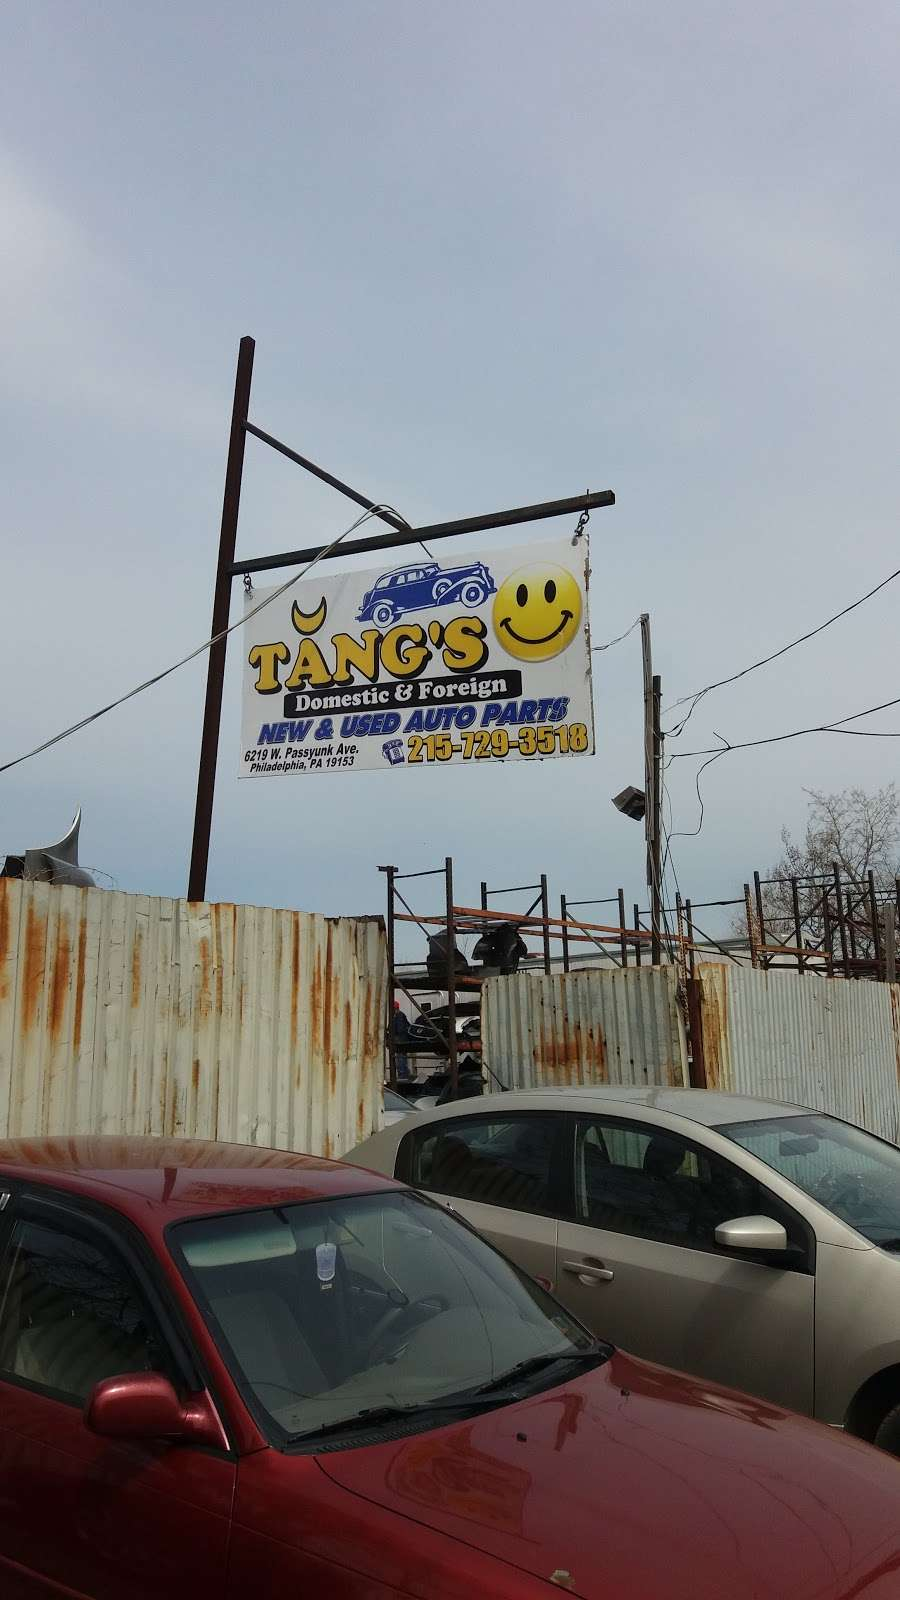 Tangs Auto Parts - car repair  | Photo 2 of 2 | Address: 6219 Passyunk Ave, Philadelphia, PA 19153, USA | Phone: (215) 729-3518